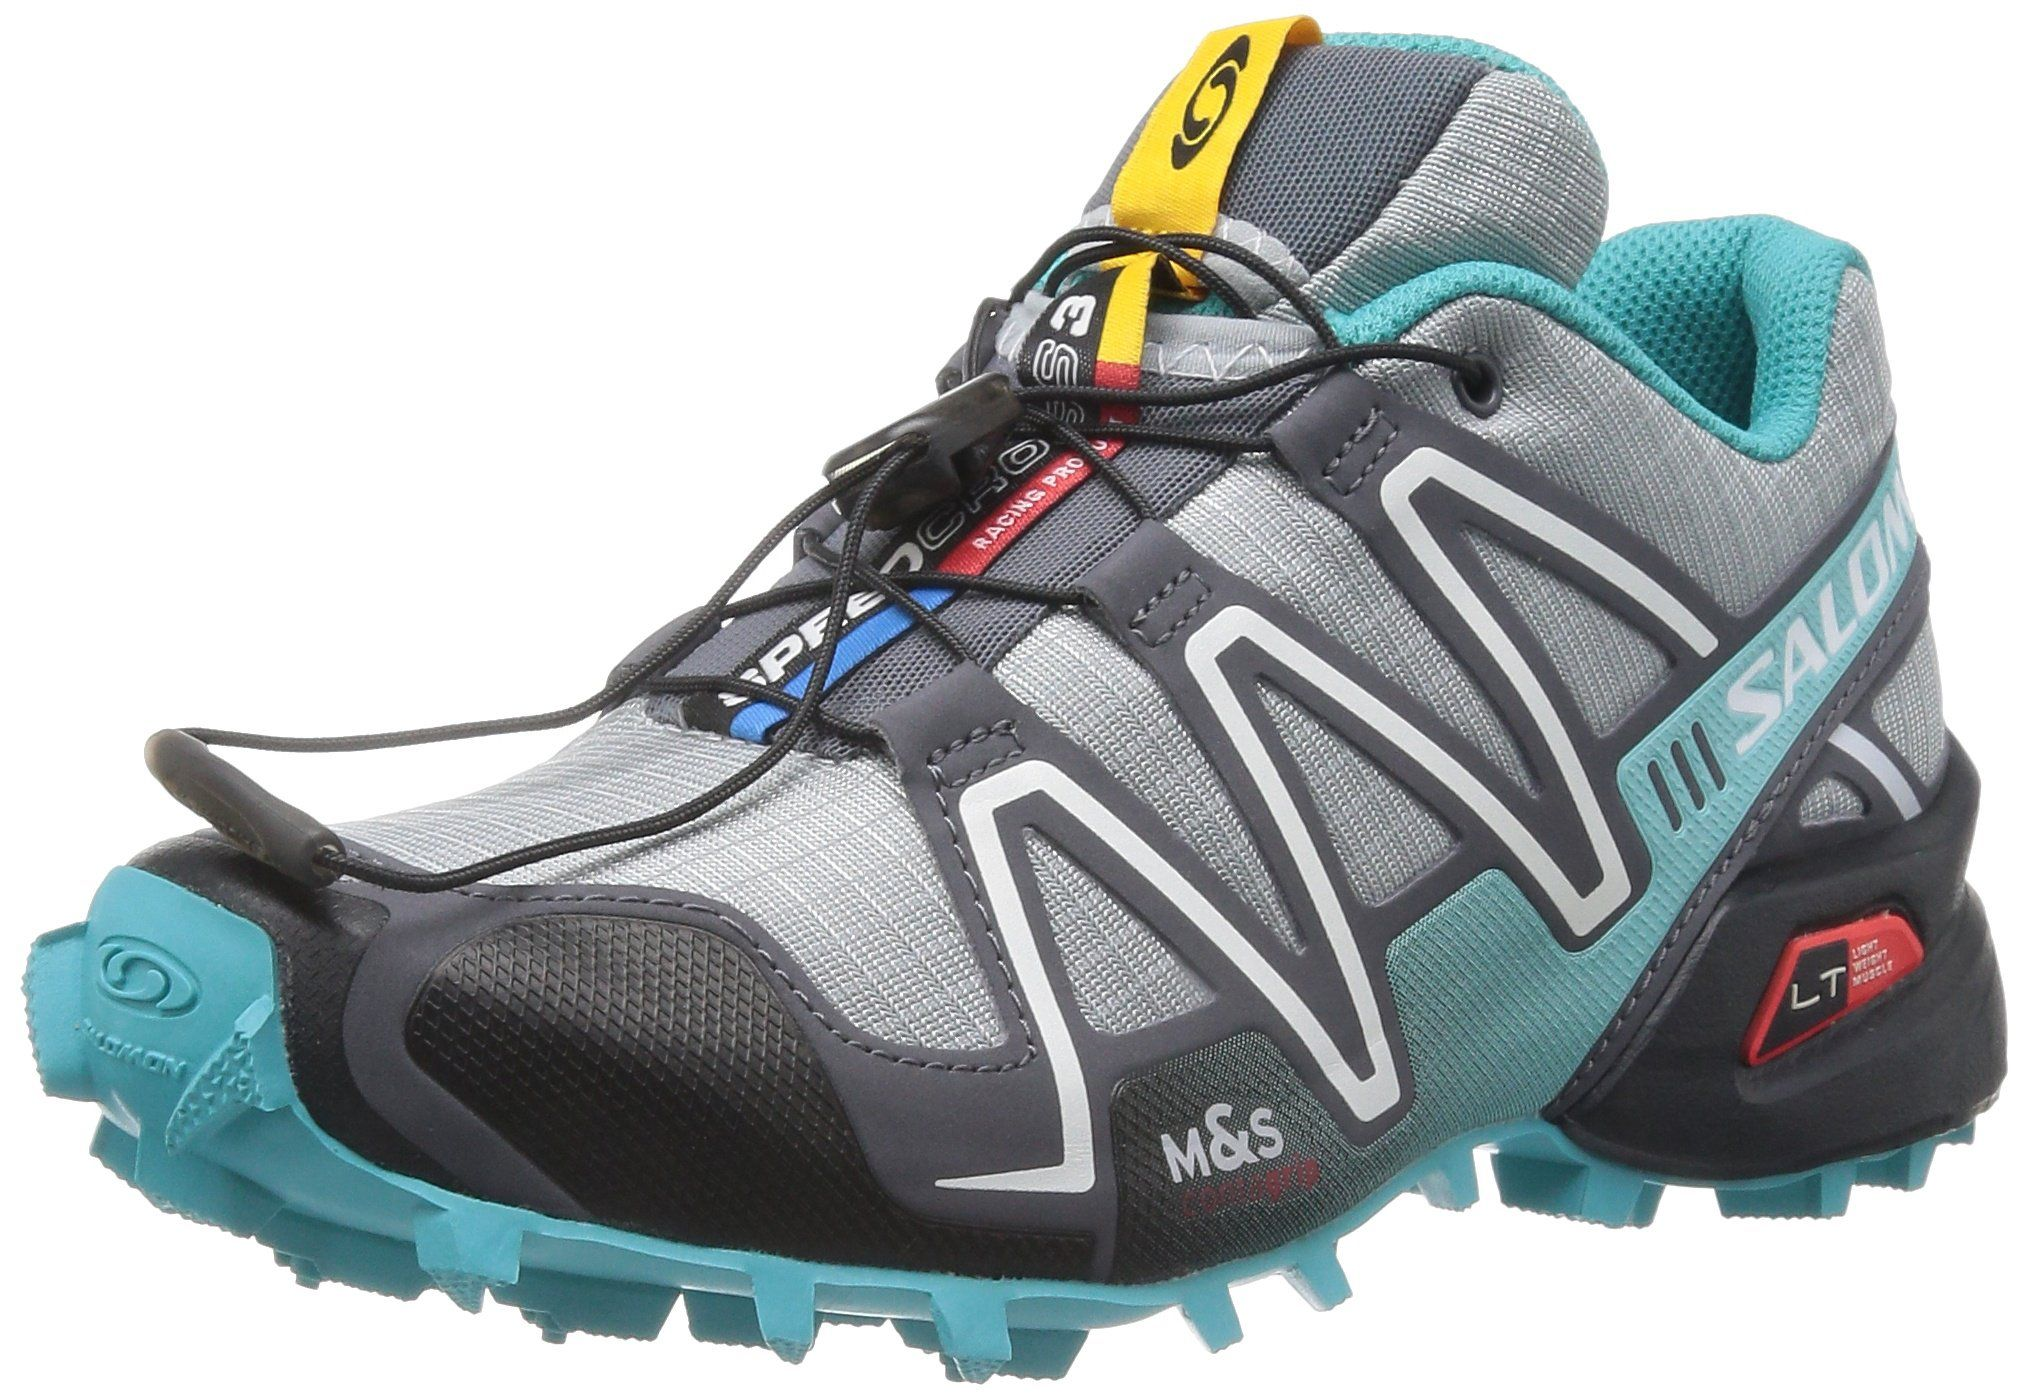 f9ddab8f2c31 ... Salomon Women s Speedcross 3 Trail Running Shoe